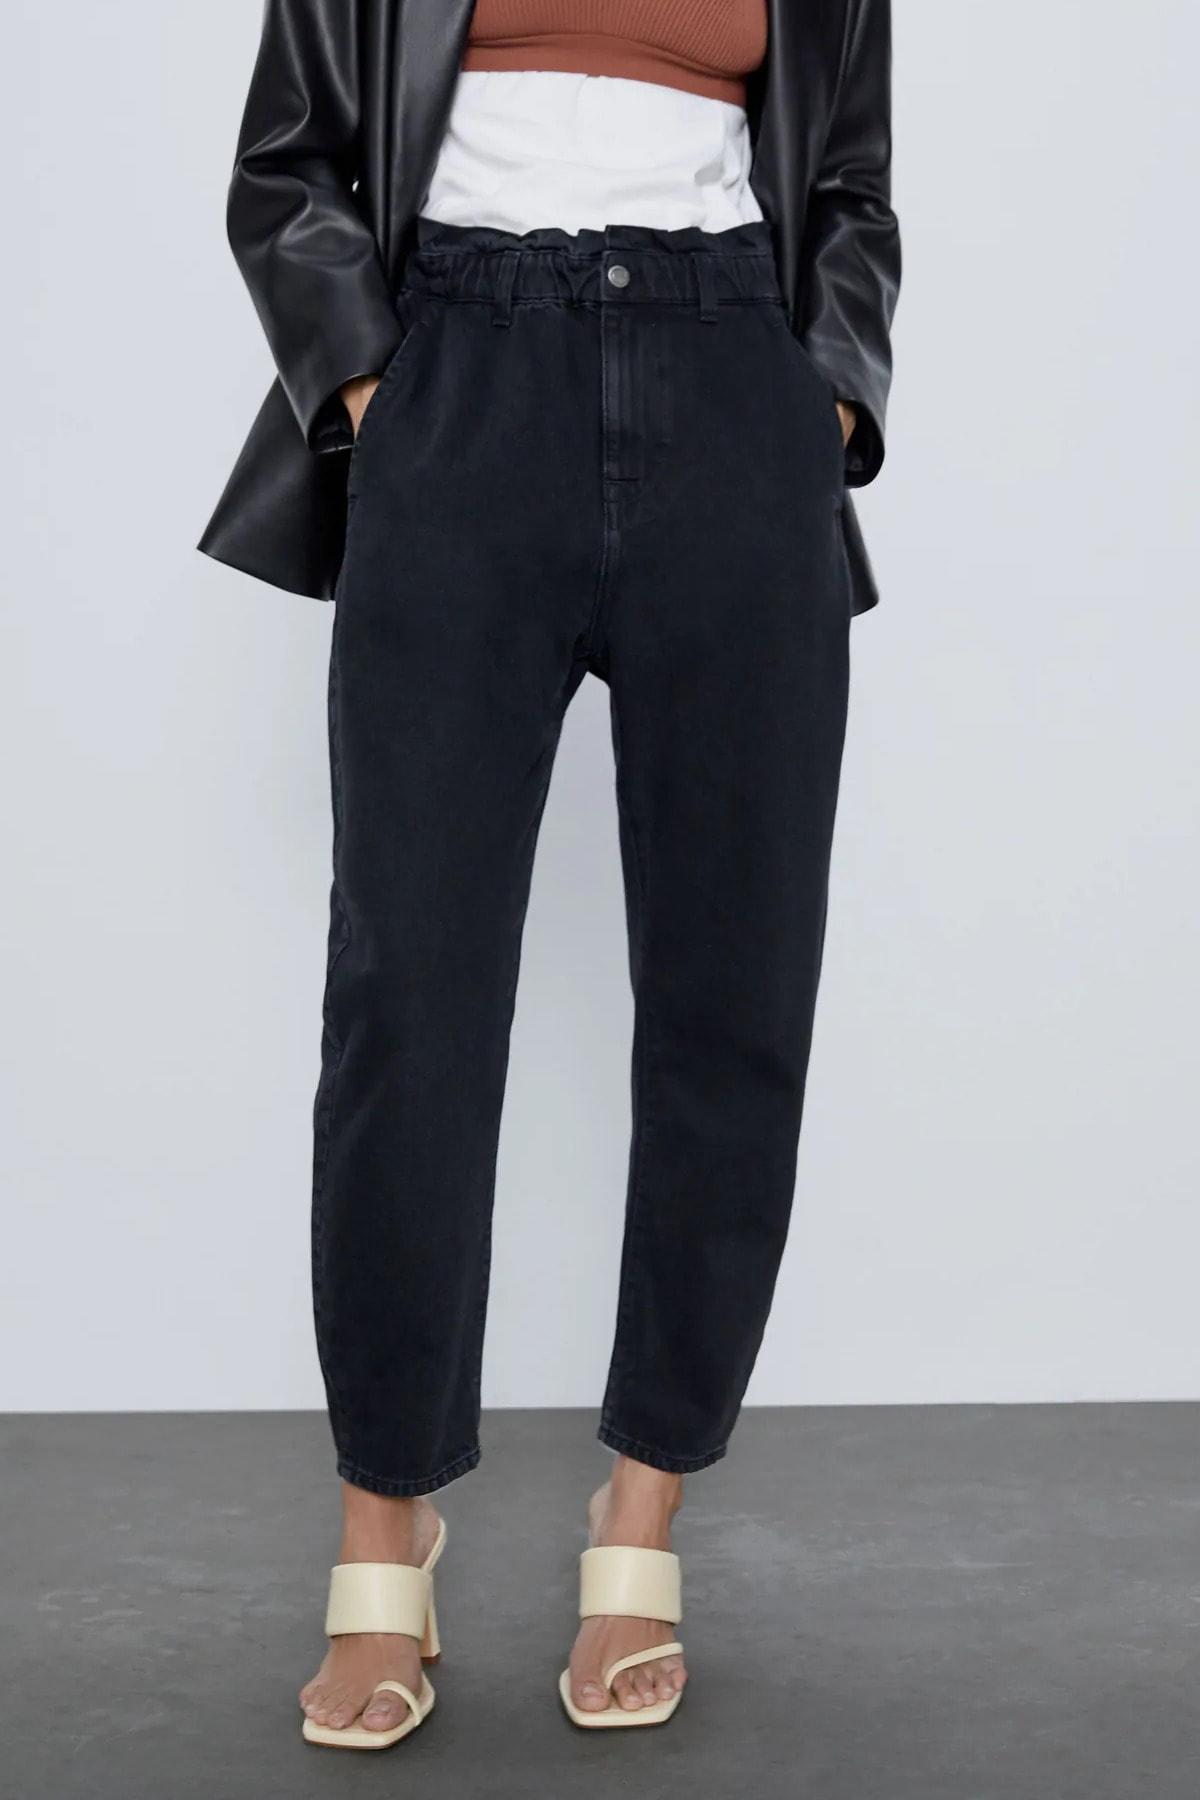 Beyaz Giyim Moda Kadın Siyah Paperbag Jeans Yüksek Bel Kot Pantolon 1